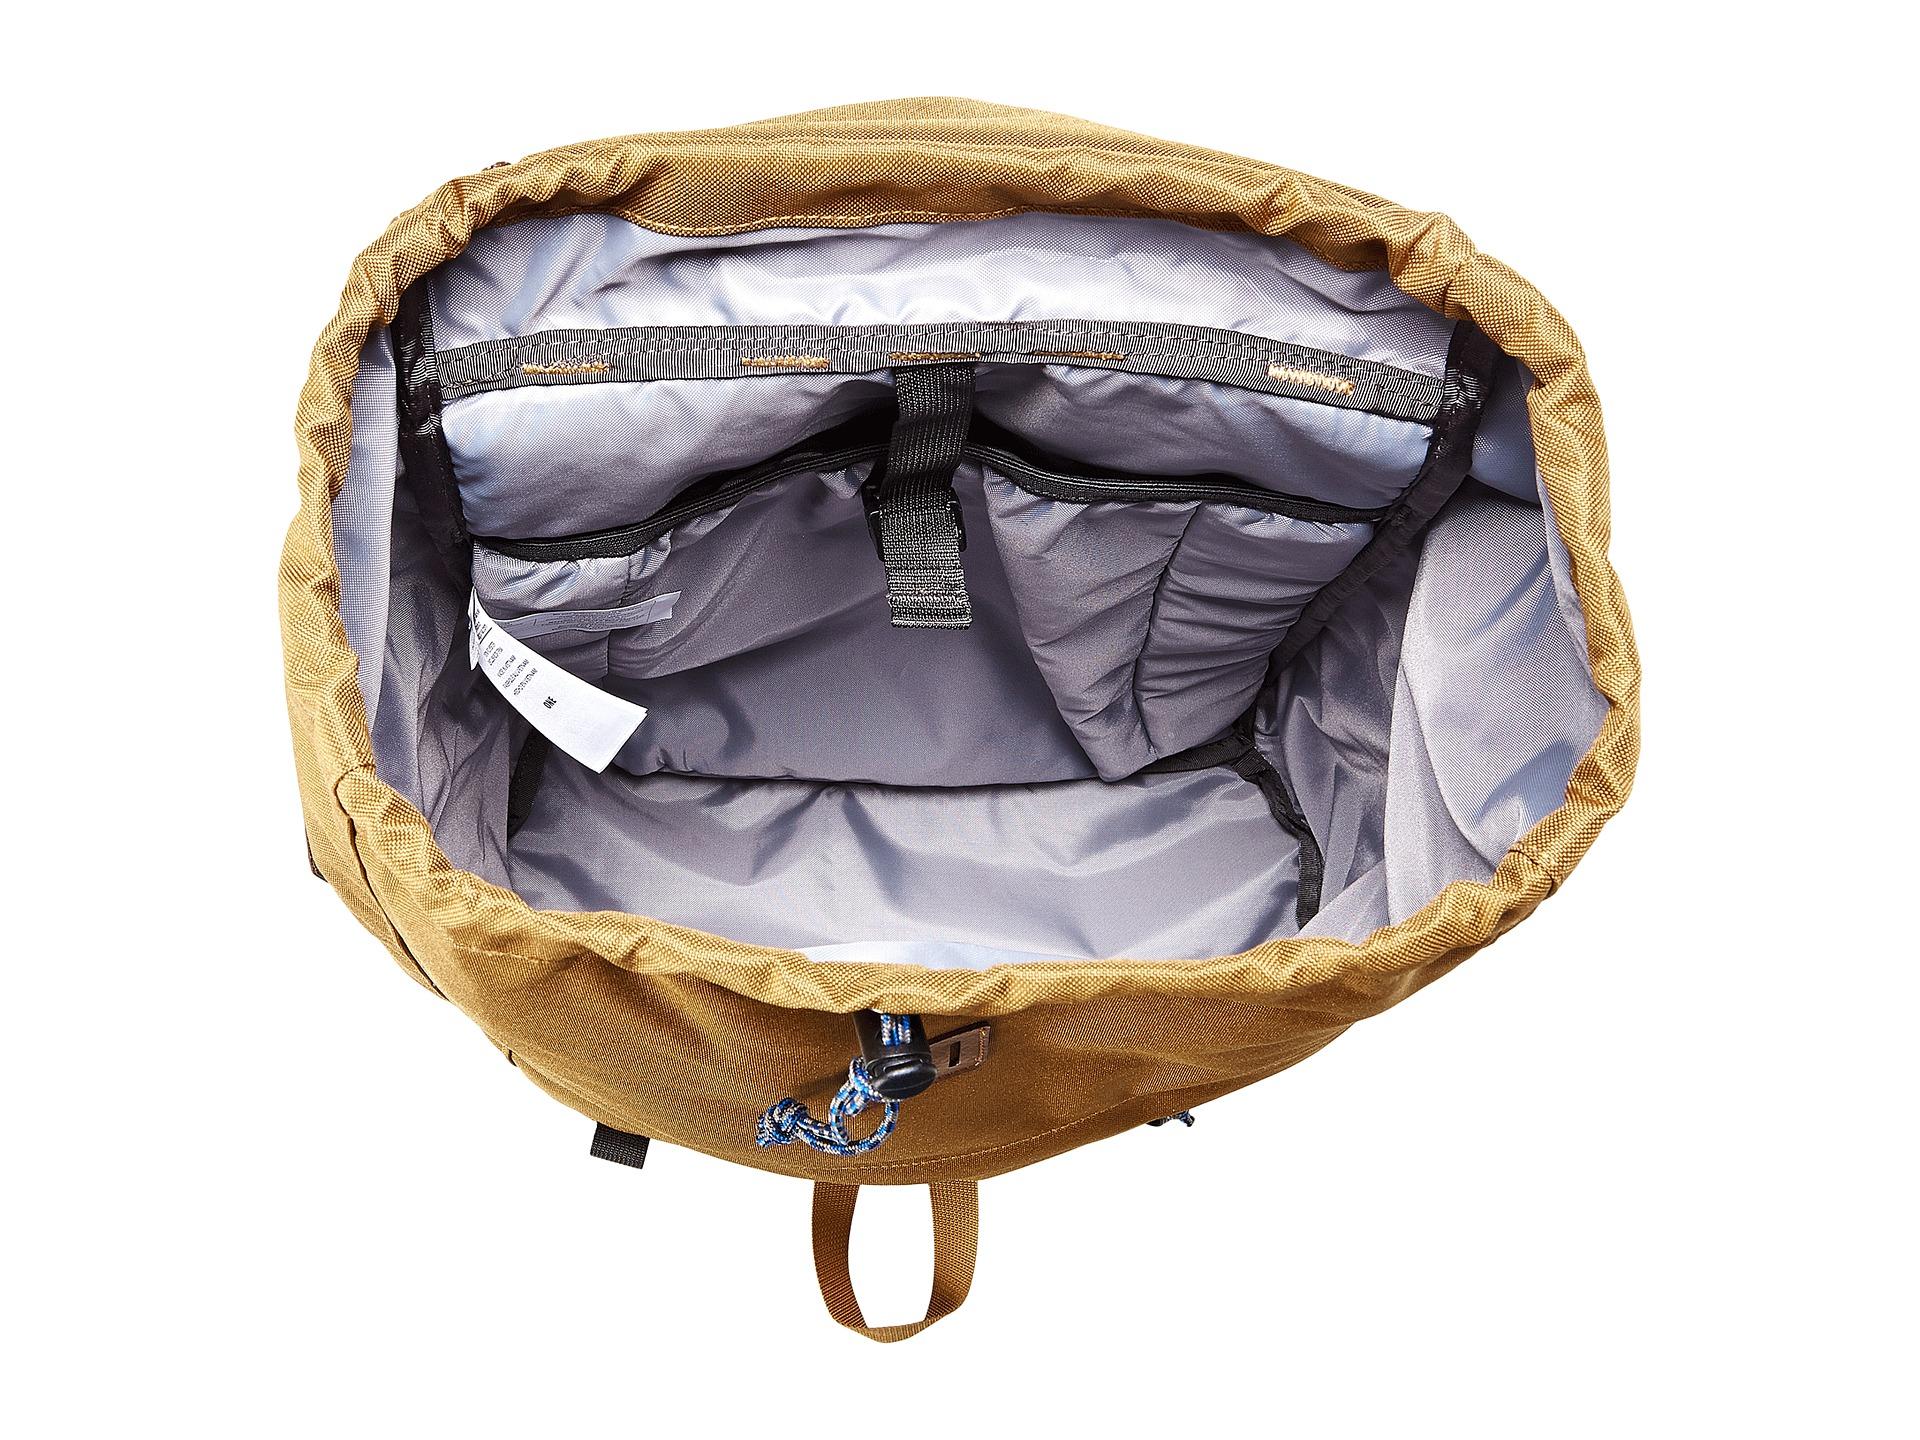 Patagonia Arbor Pack 26L Zapposcom Free Shipping BOTH Ways